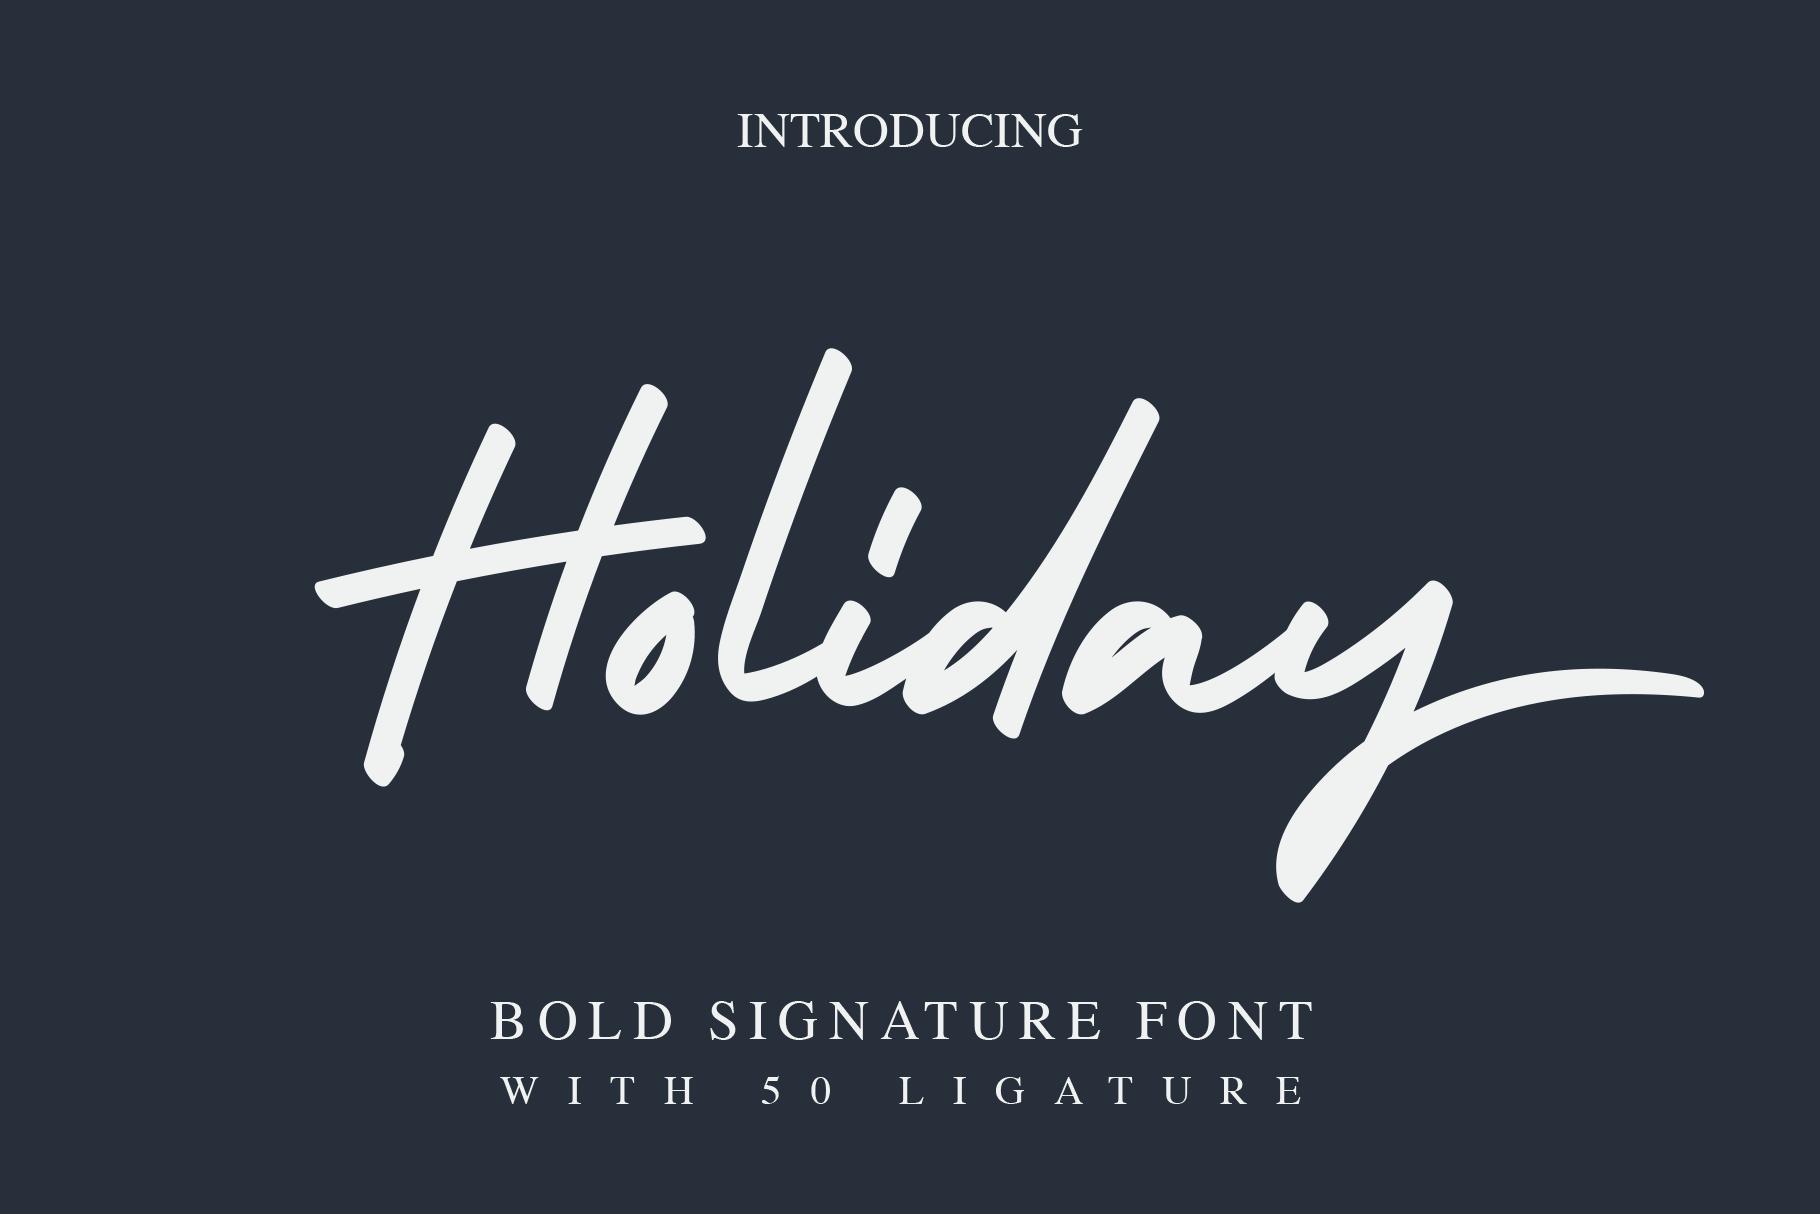 https://fontclarity.com/wp-content/uploads/2019/09/holiday-bold-script-font-download-0.png Free Download